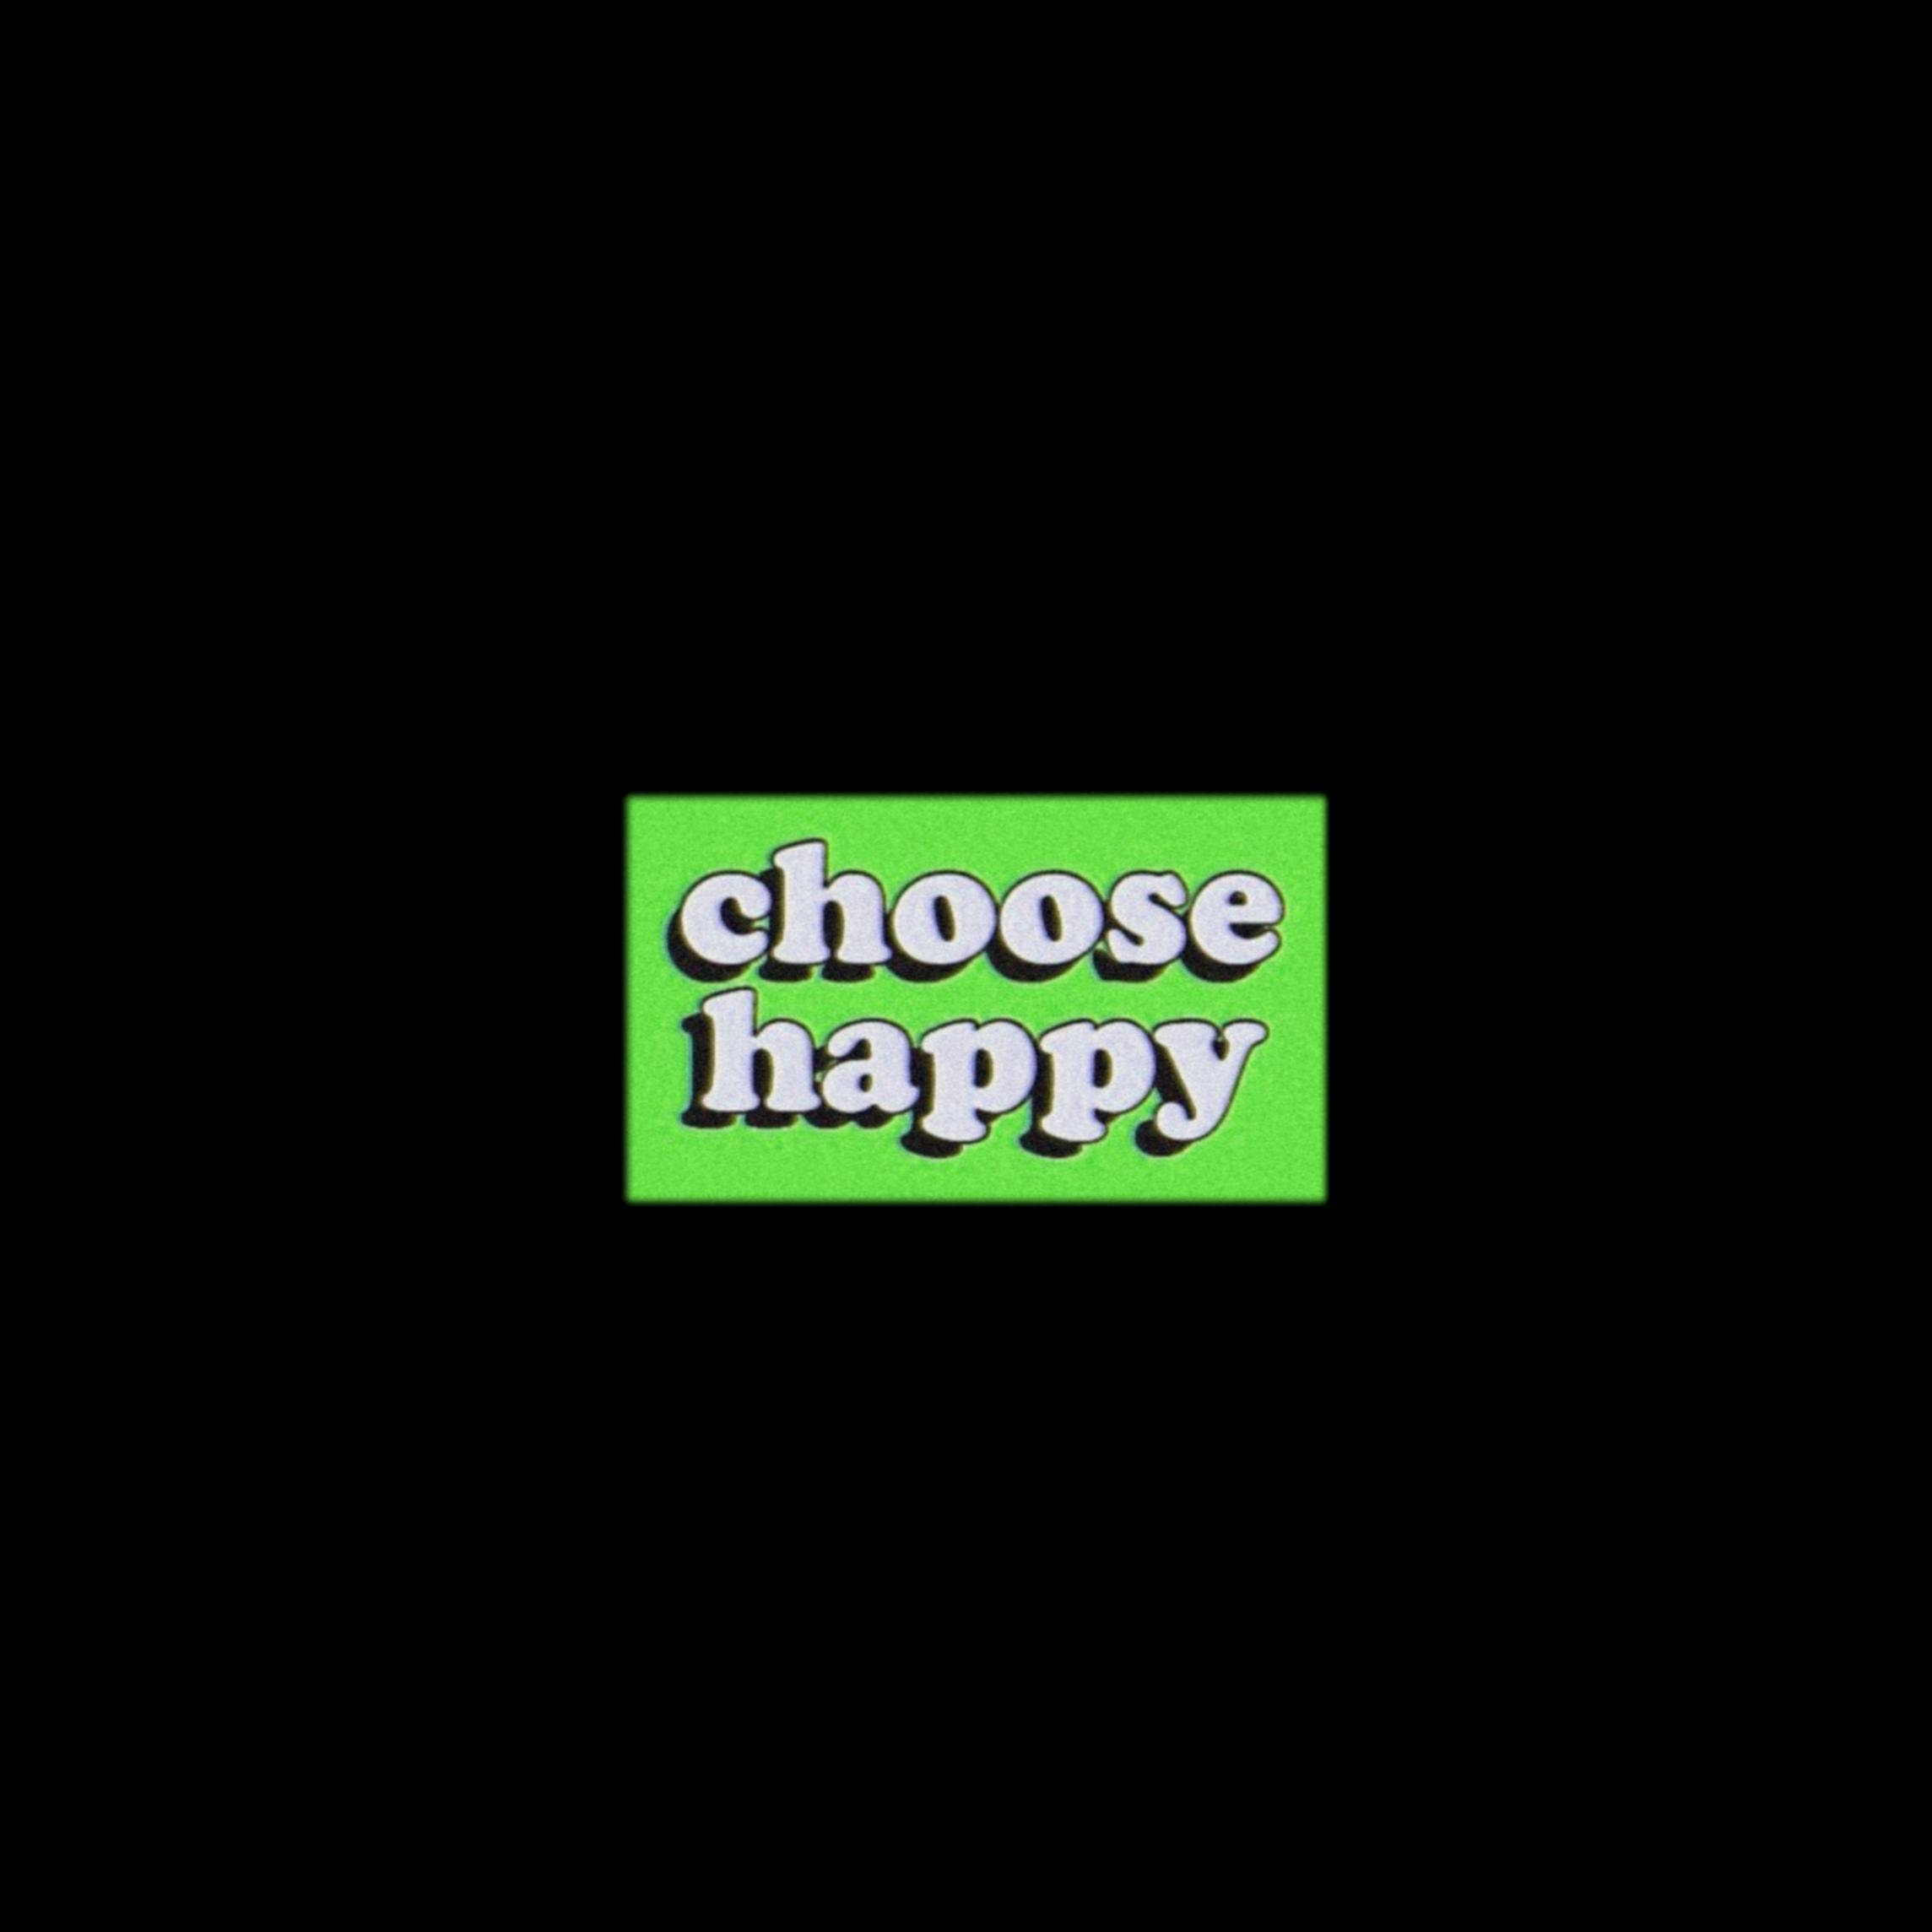 happy choose choosehappy quotes green greenaesthetic